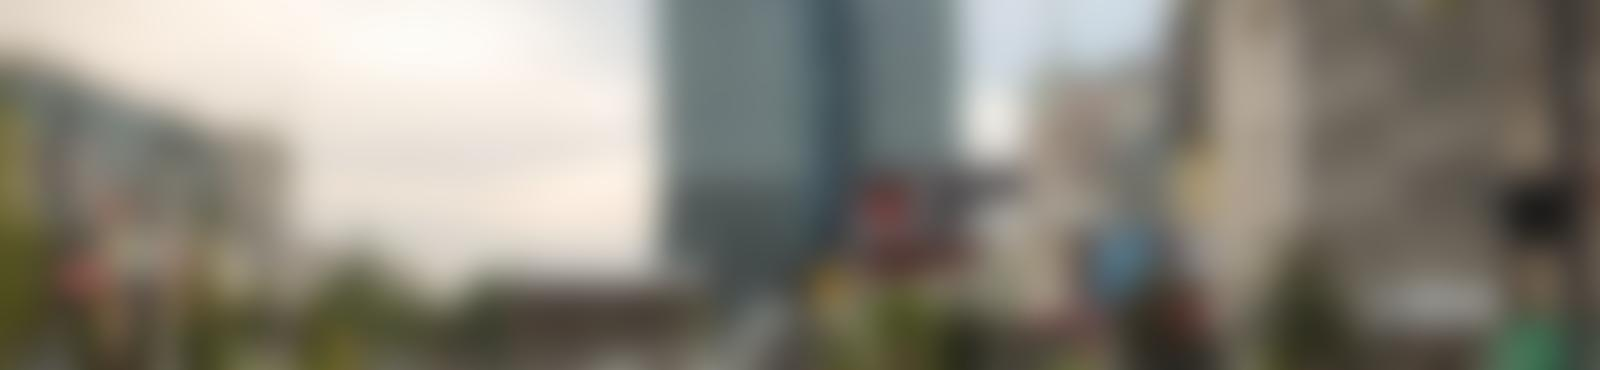 Blurred 711efc74 0a5c 407d 97a1 d343d70650f6